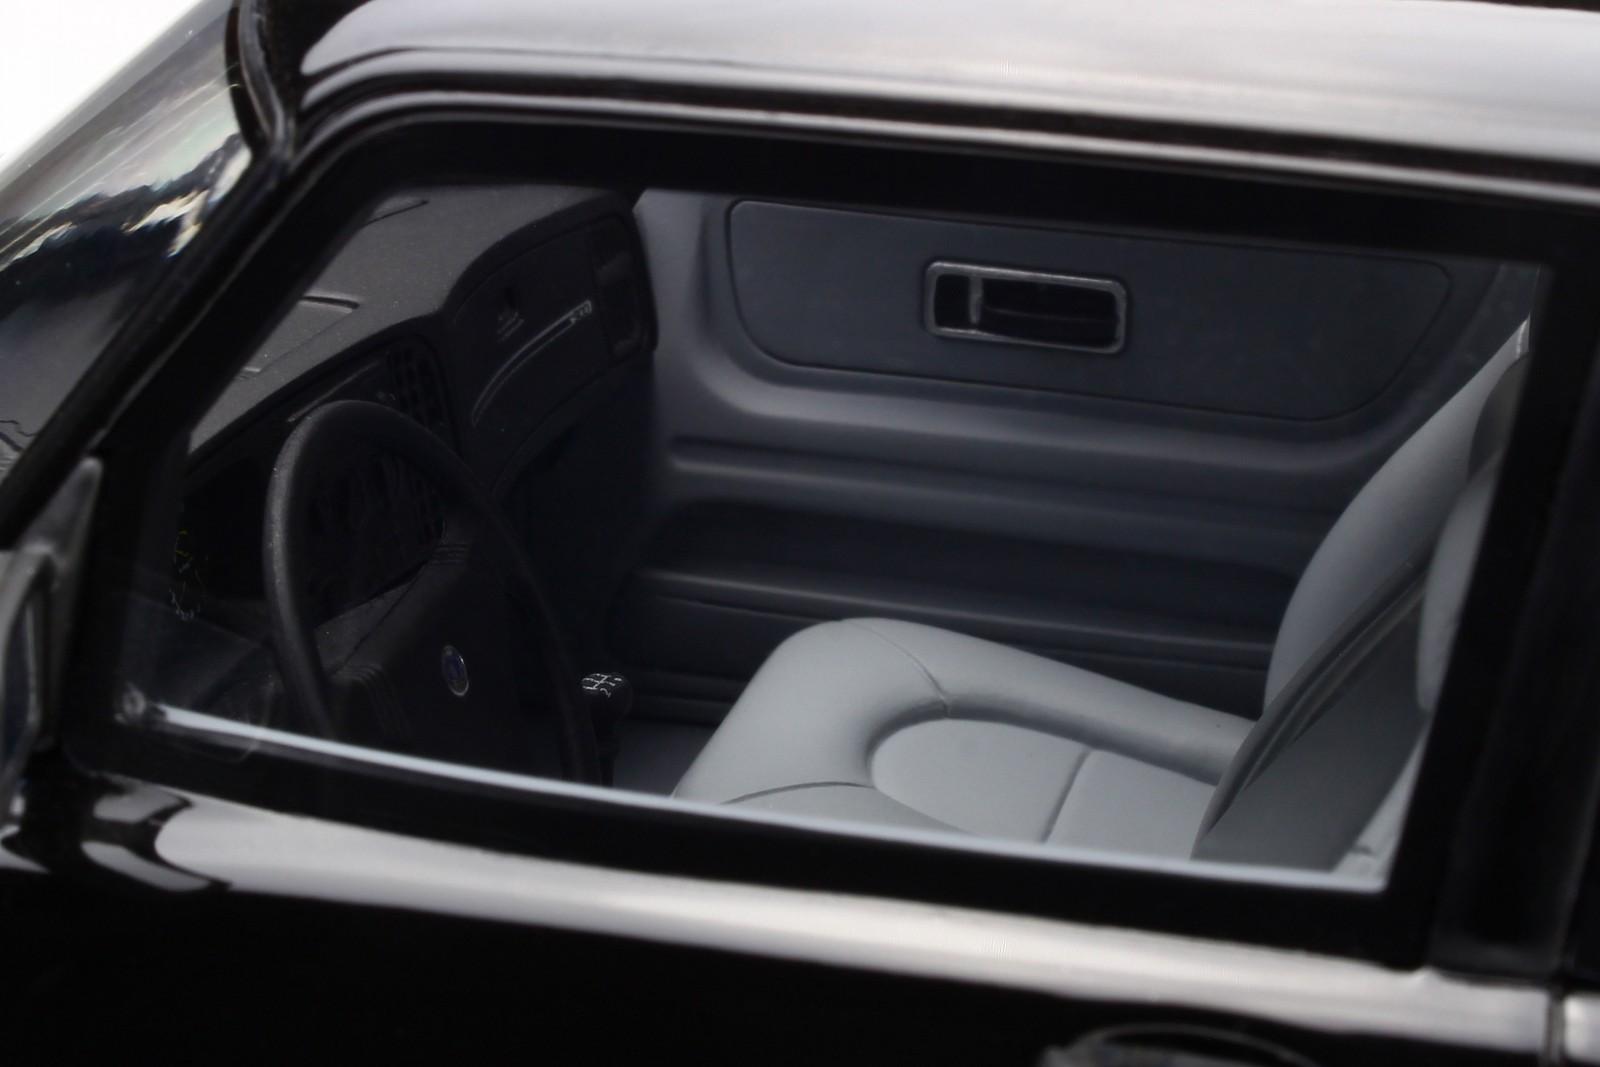 Saab-900-Turbo-Phase-1-black-resin-modelcar-OT678-Otto-1-18 thumbnail 6